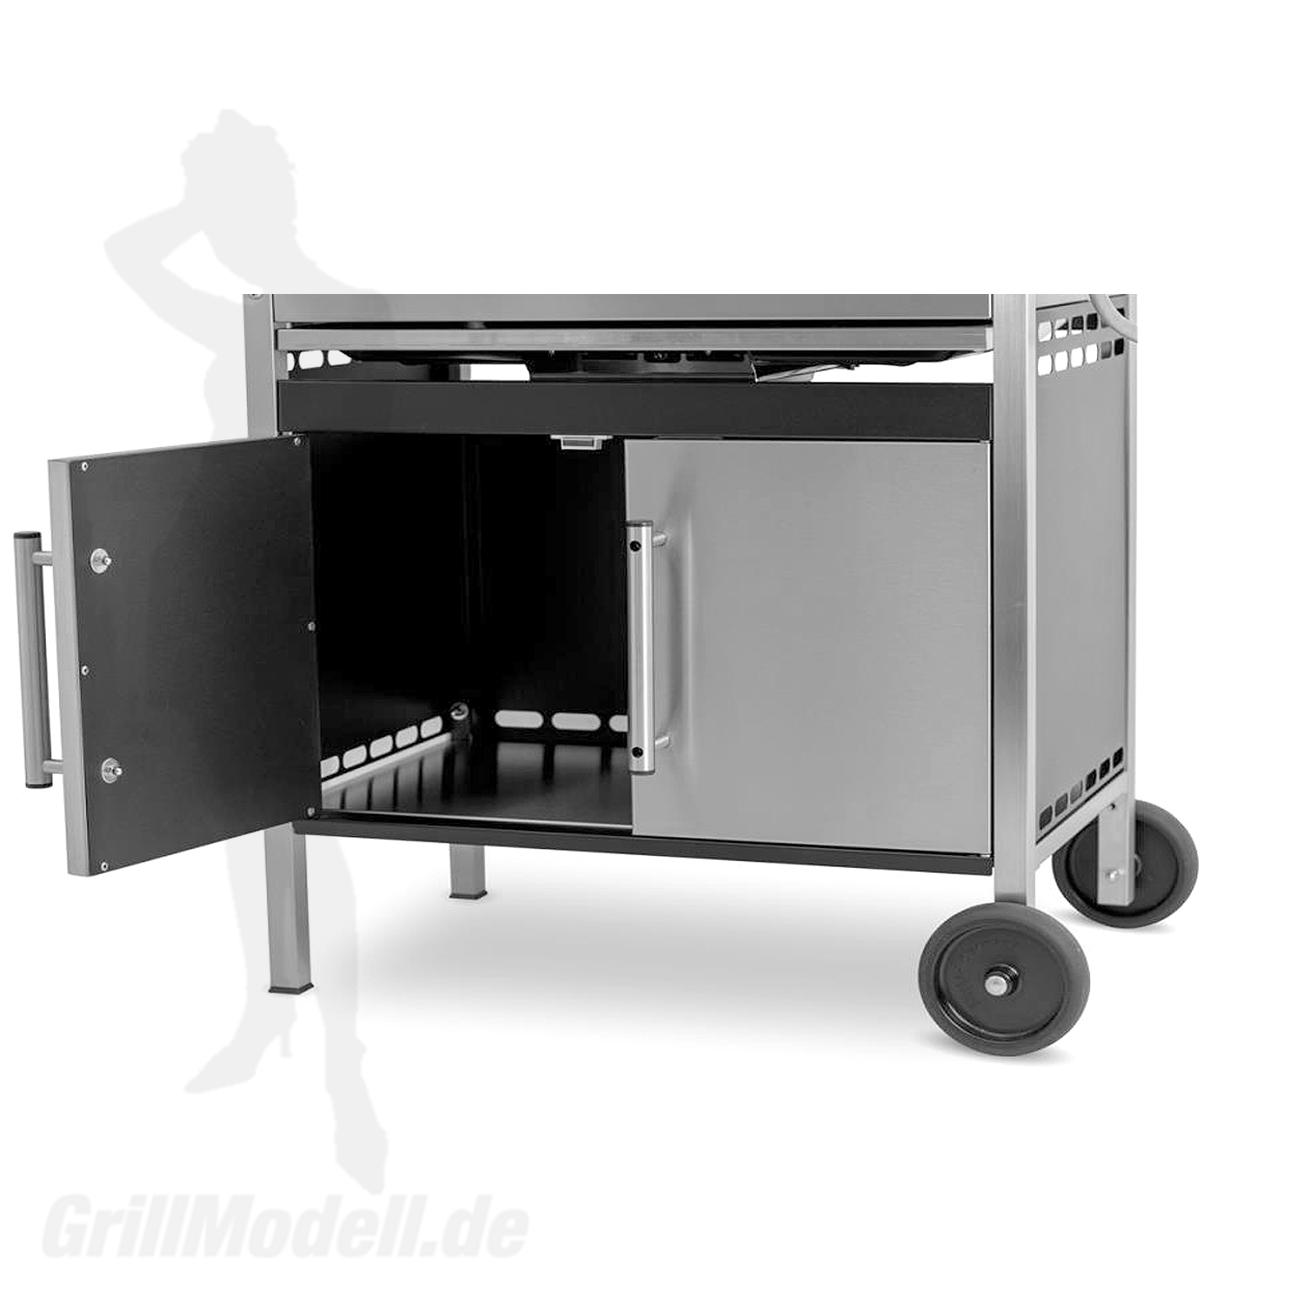 Unterschrank für Edelstahlgrill Holzkohlegrill Edelstar XL 2 türig